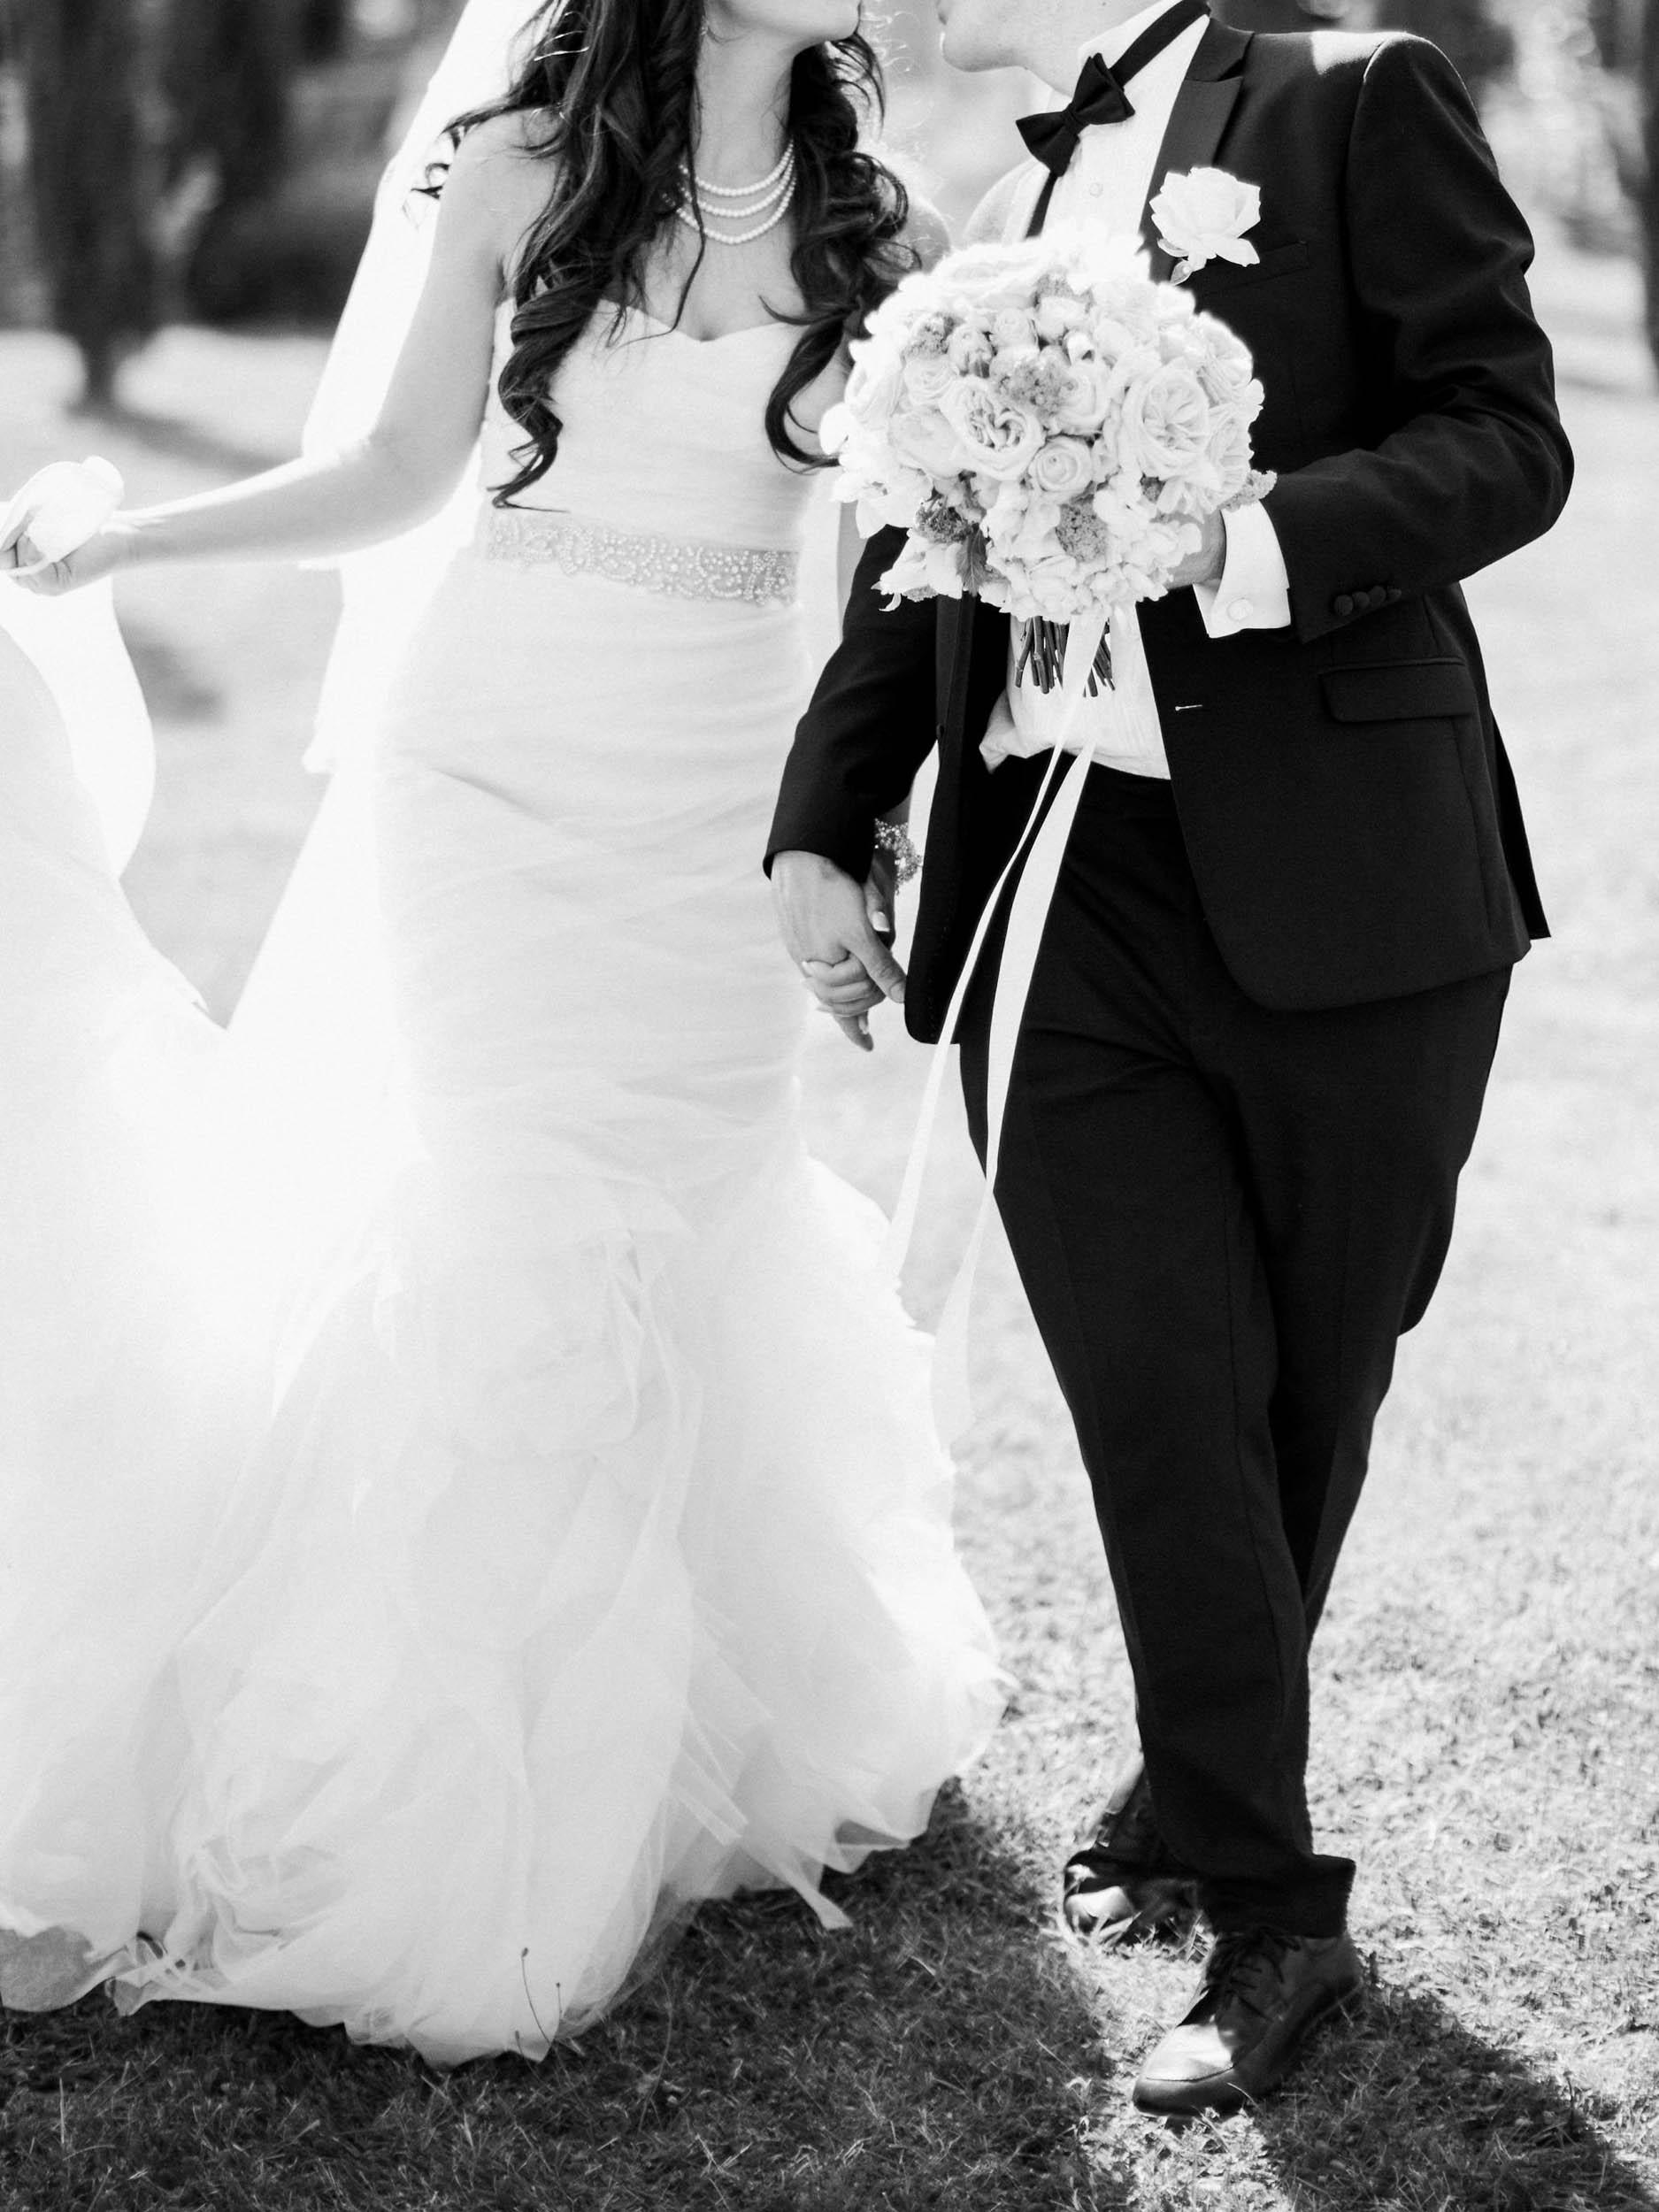 Amy O'Boyle Photography- Destination & UK Fine Art Film Wedding Photographer- Chateau La Durantie Wedding-34.jpg